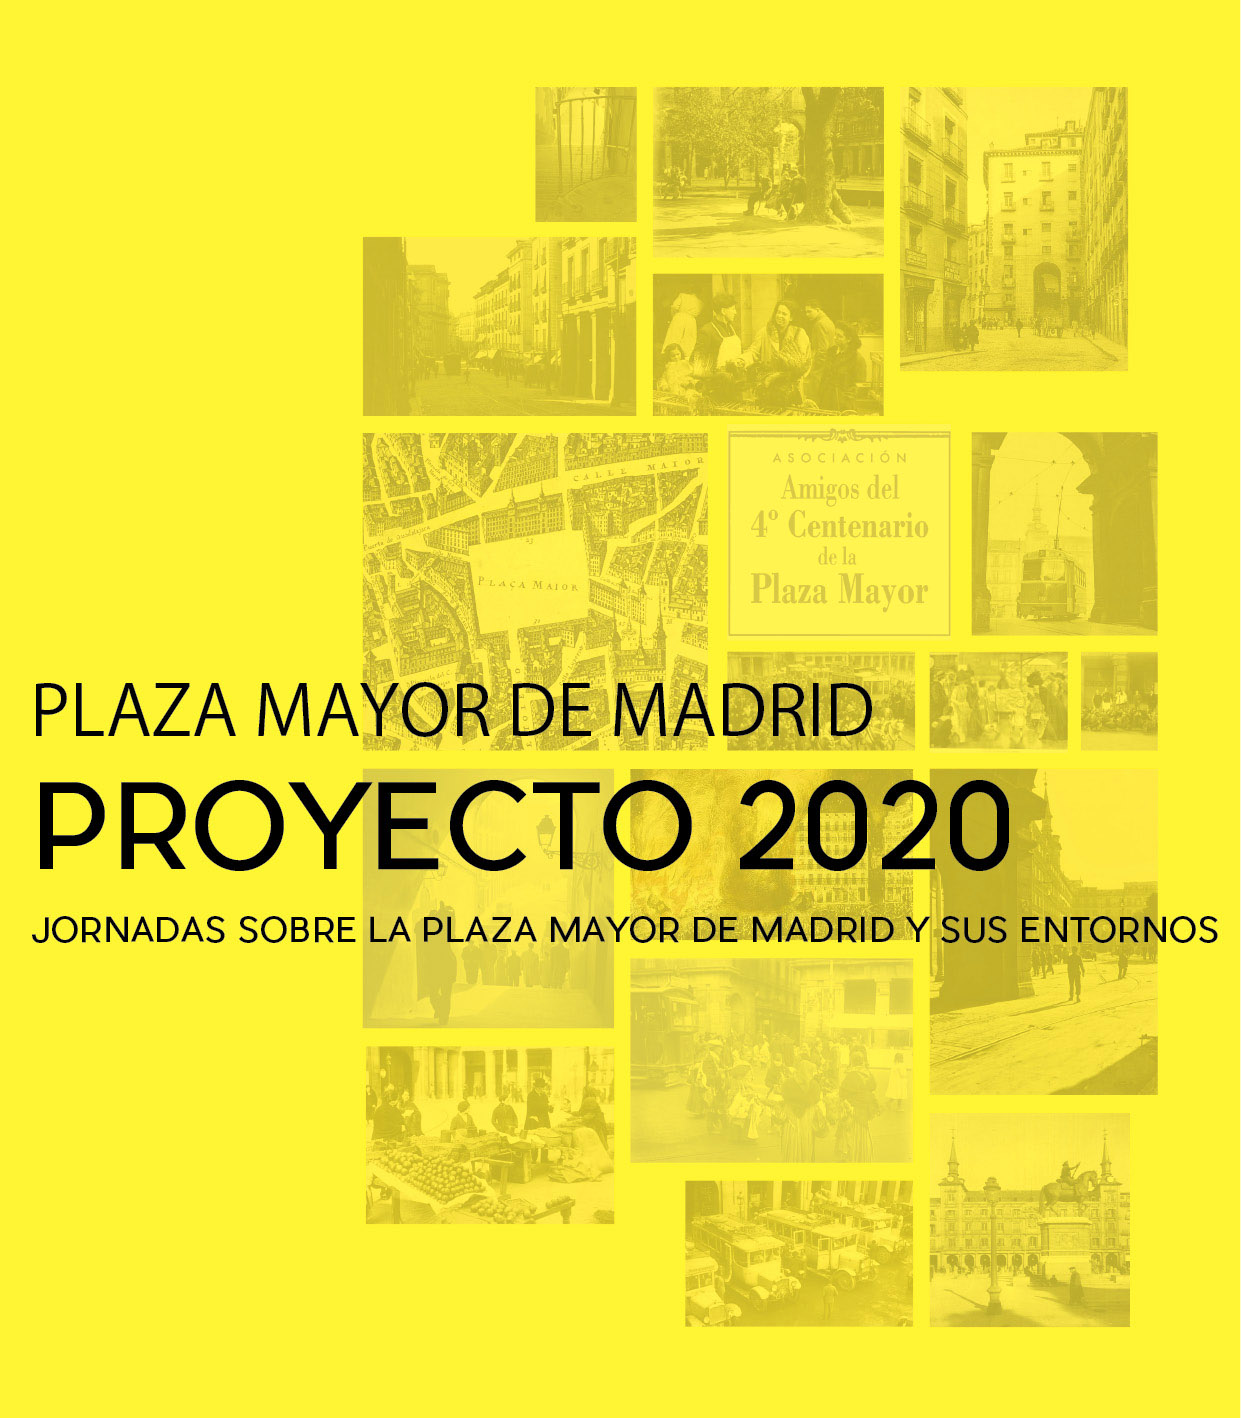 proyecto 2020B .jpg